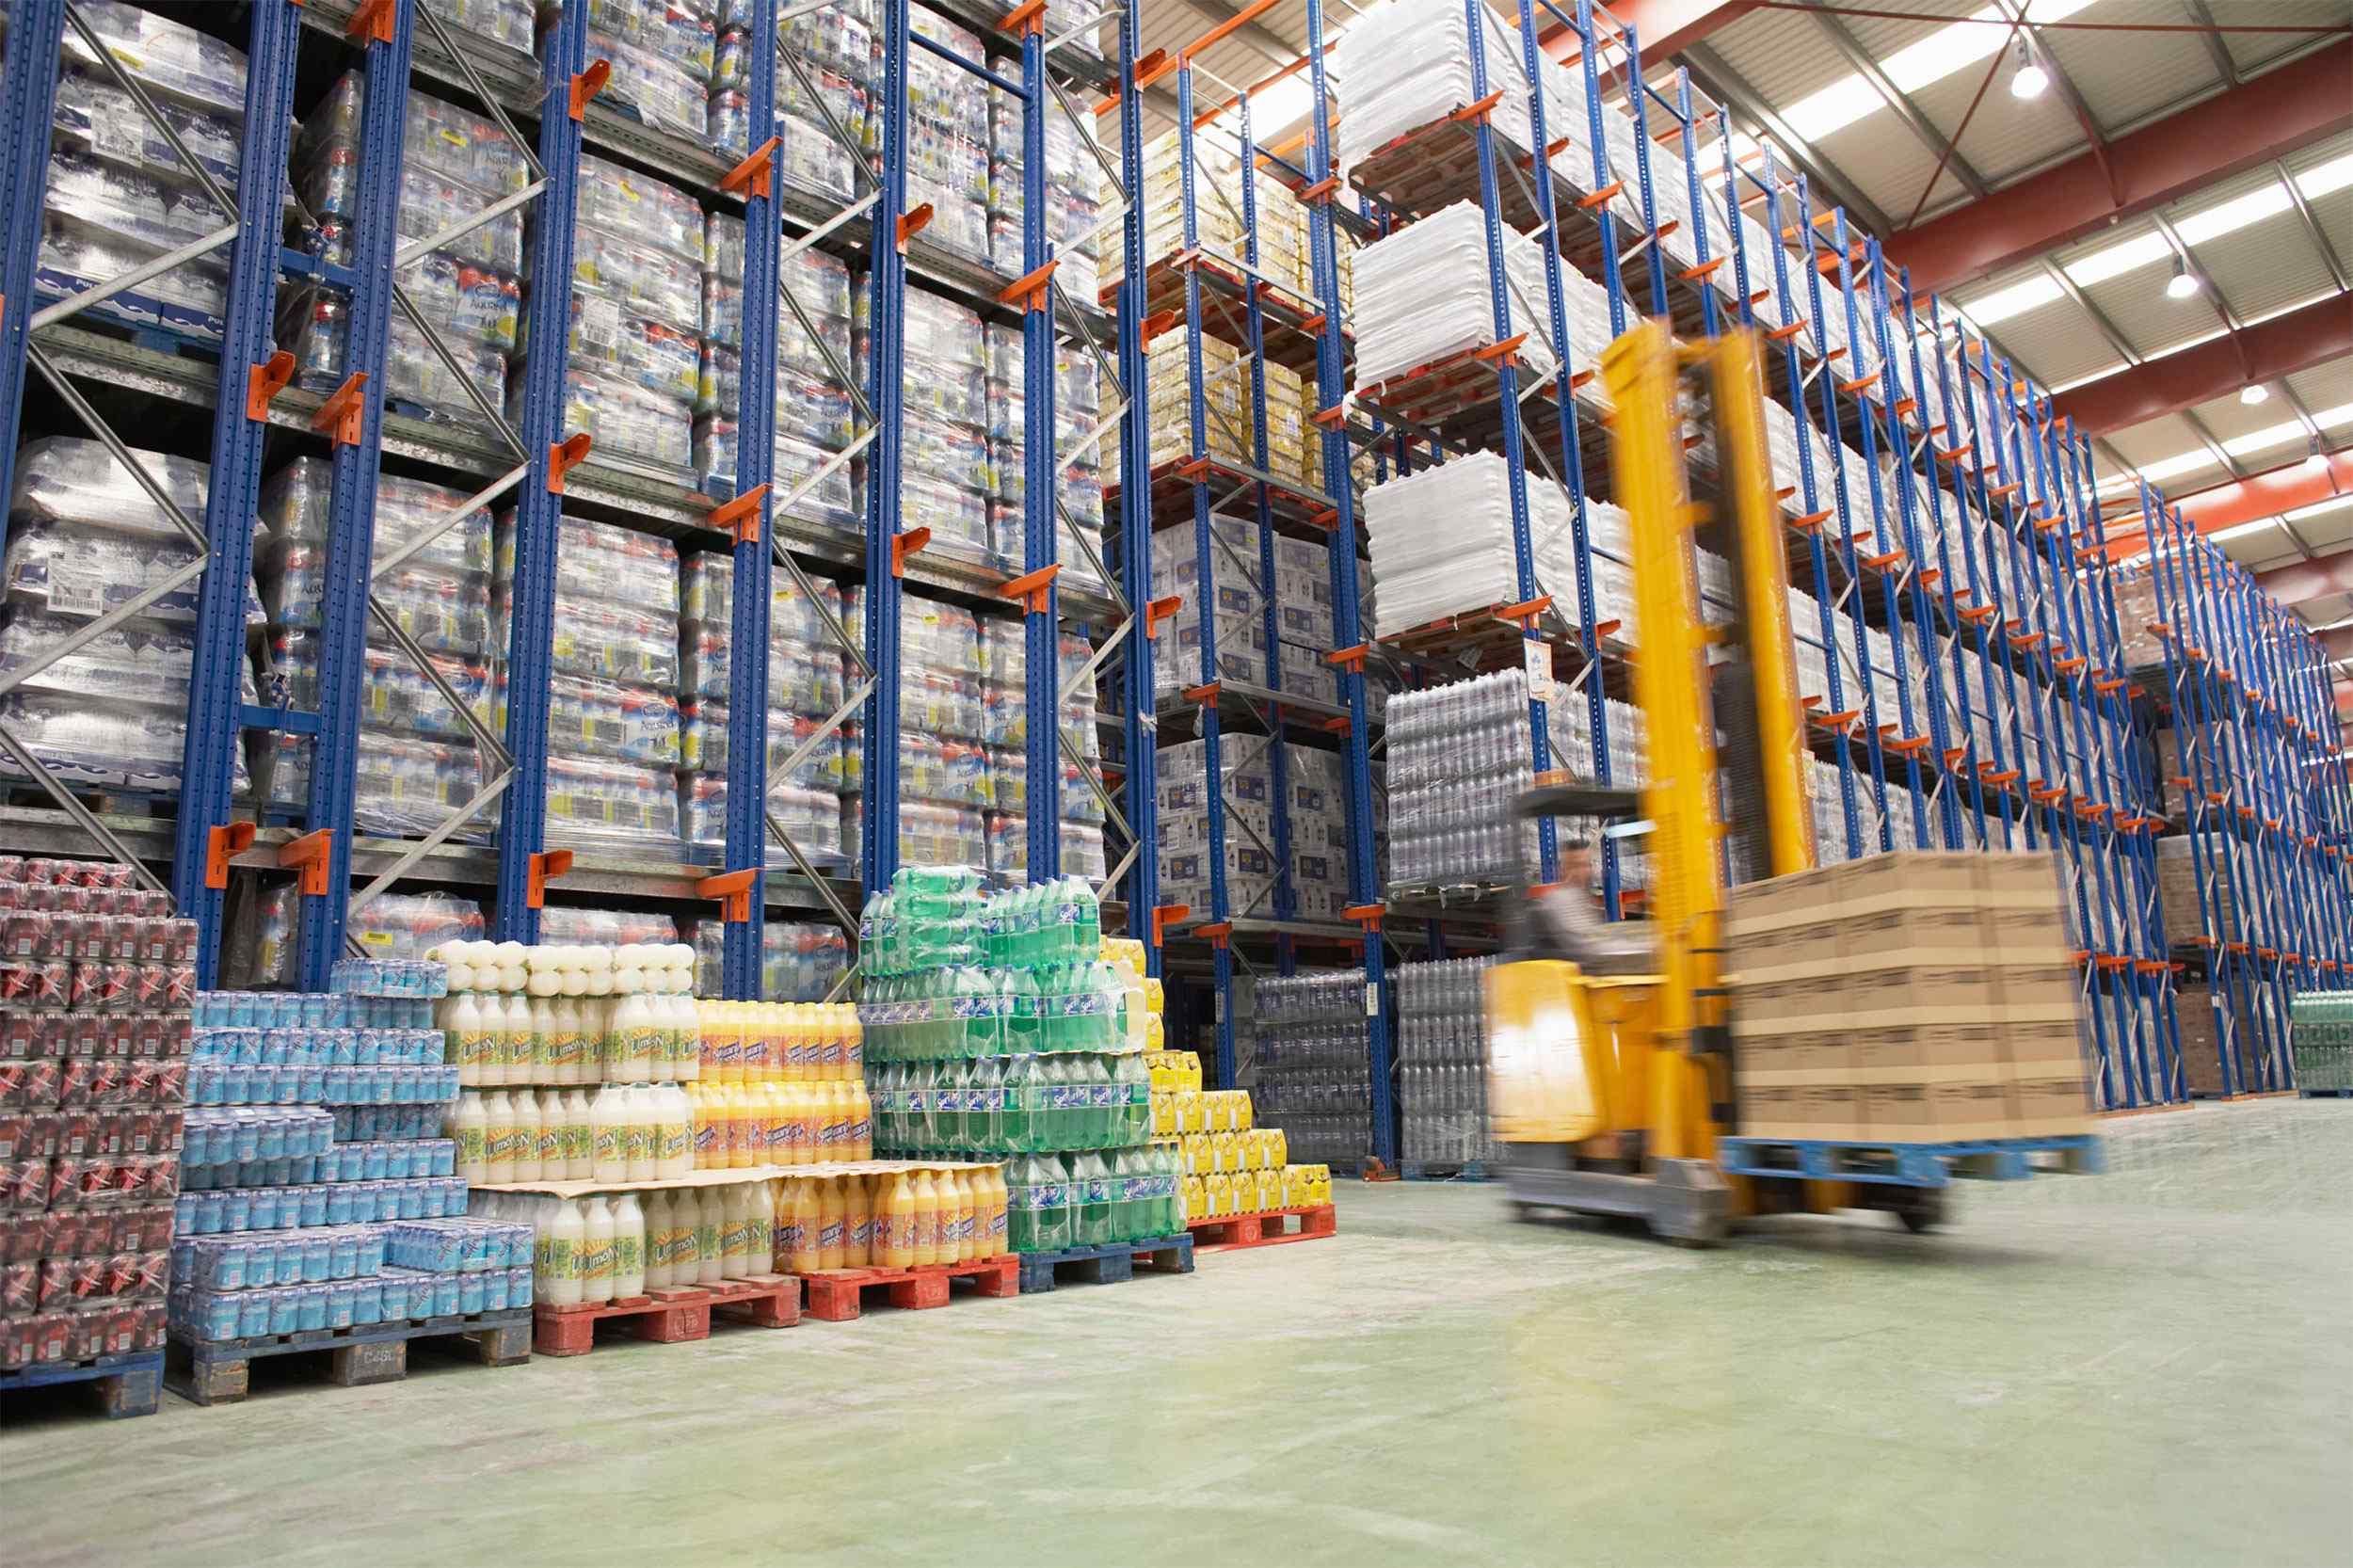 https://baikay.com/wp-content/uploads/2015/09/Warehouse-and-lifter1.jpg